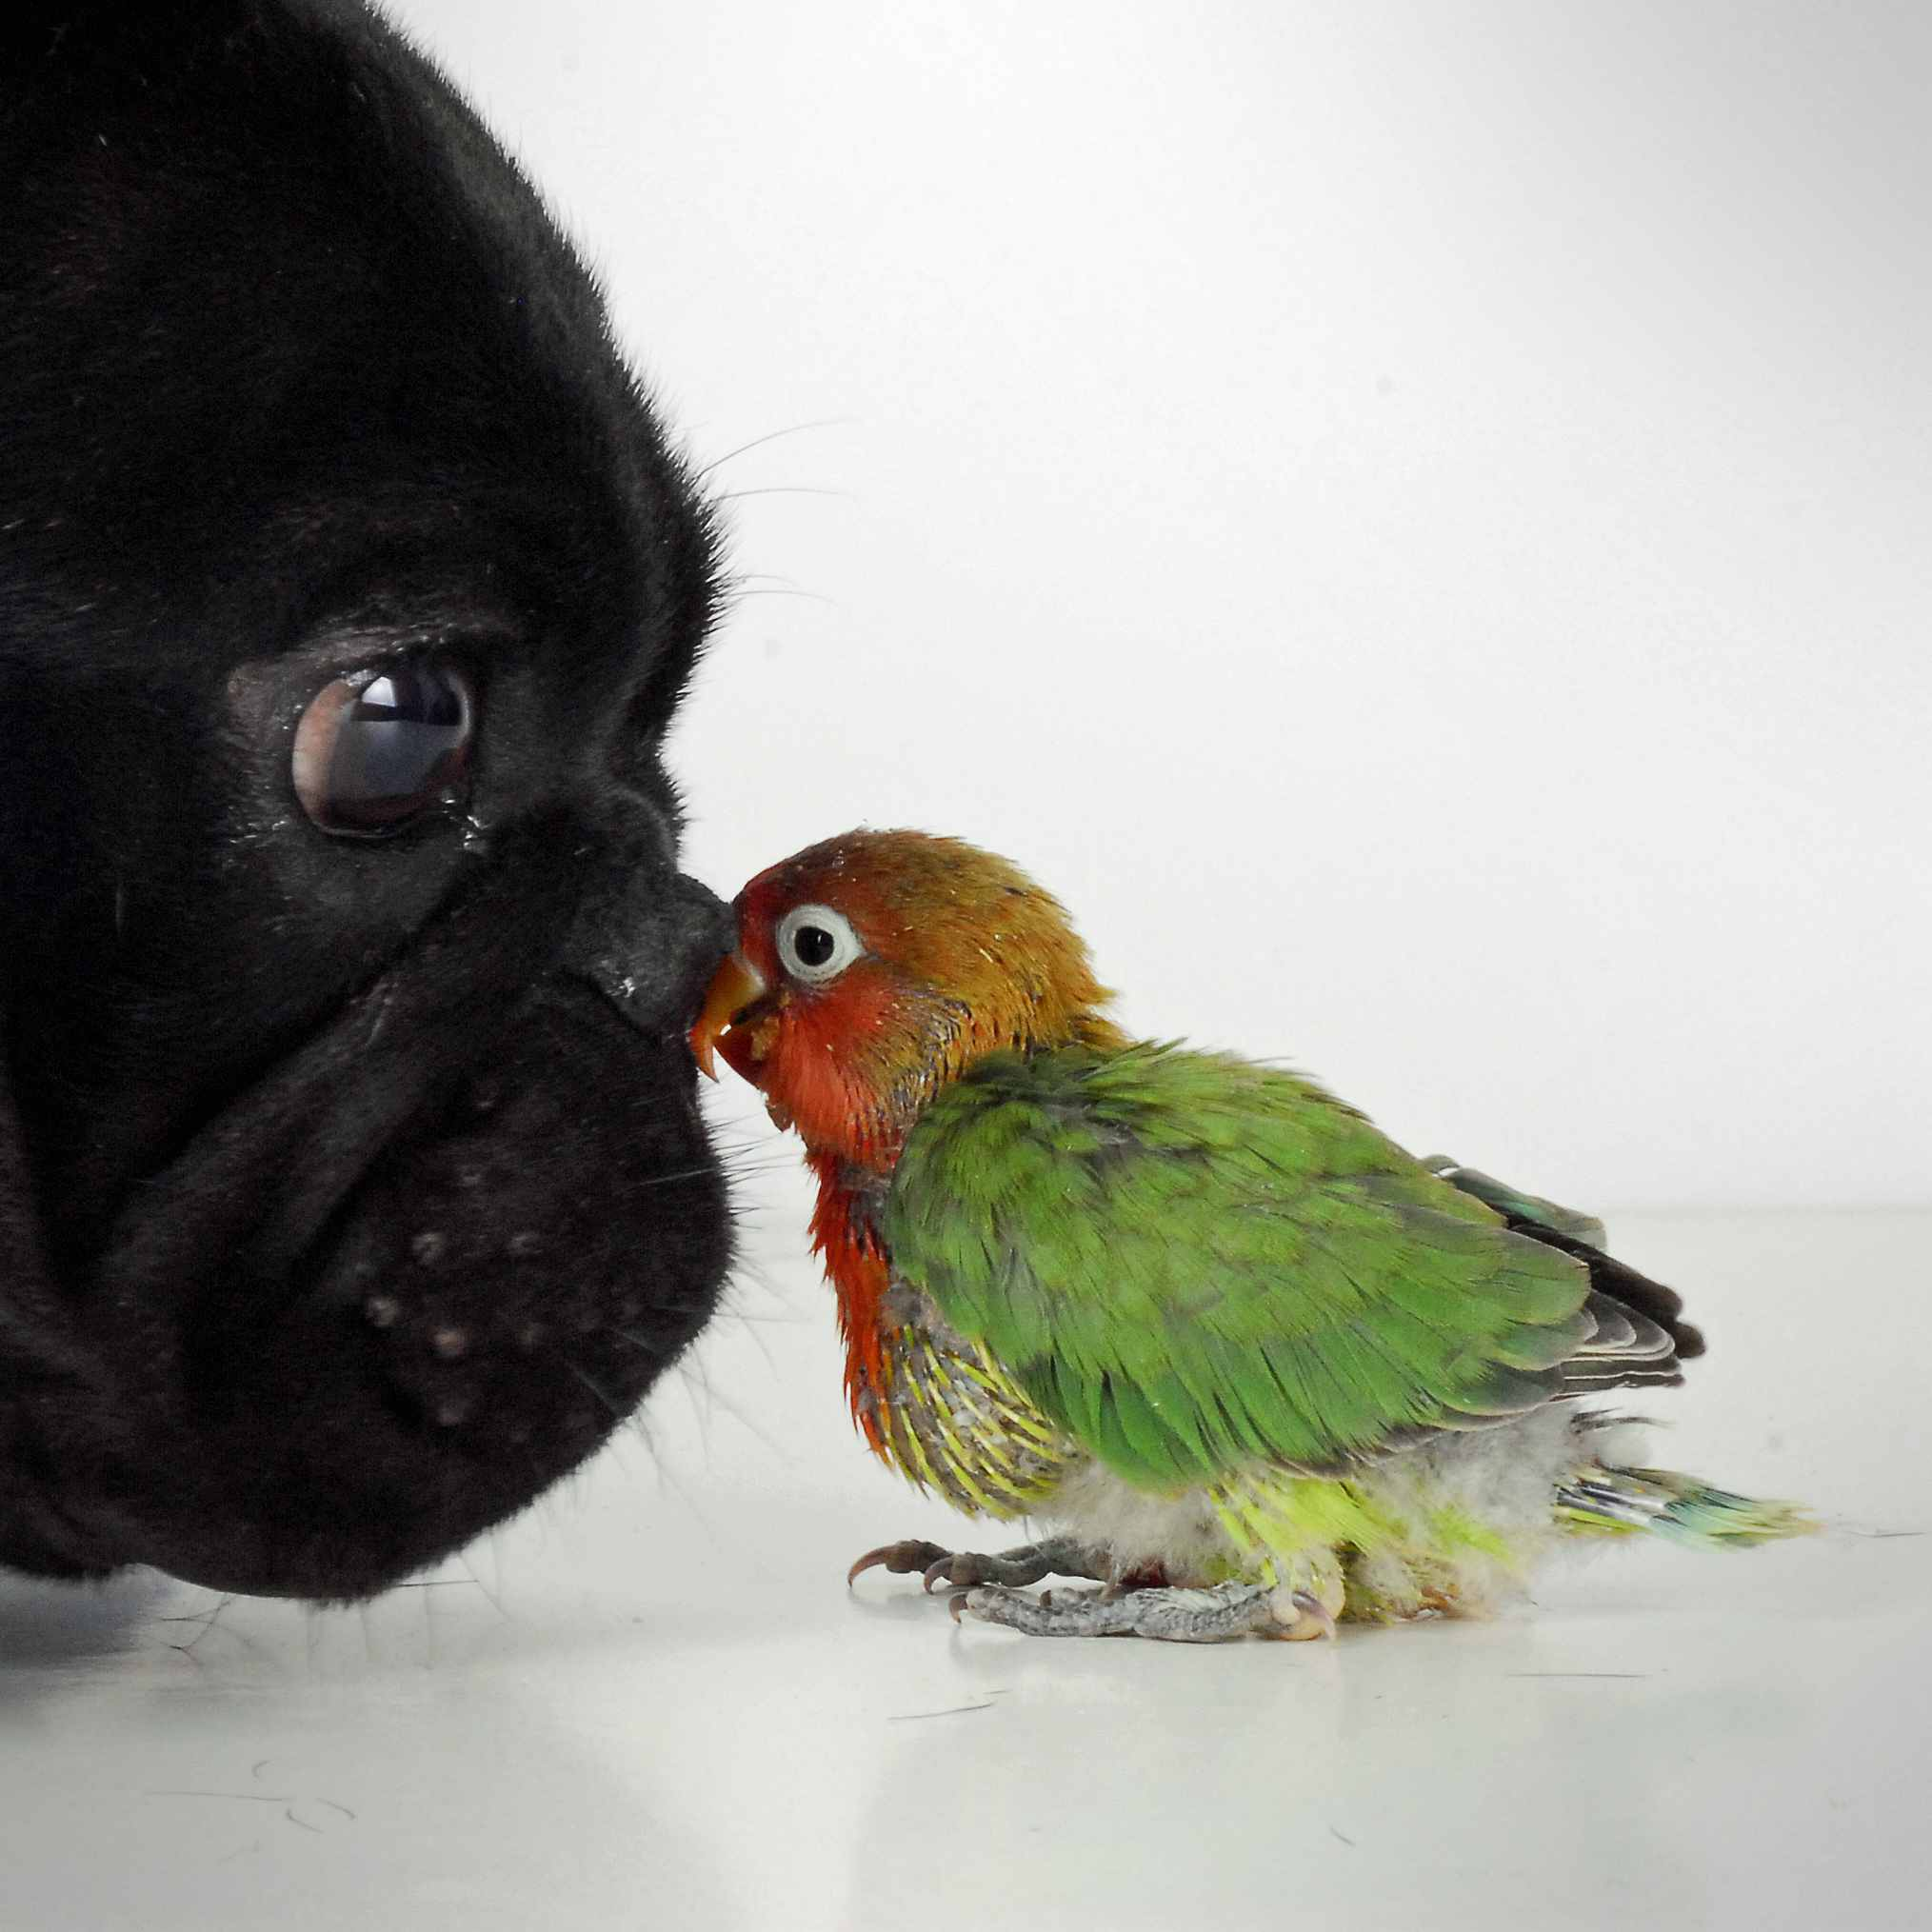 French bulldog and lovebird